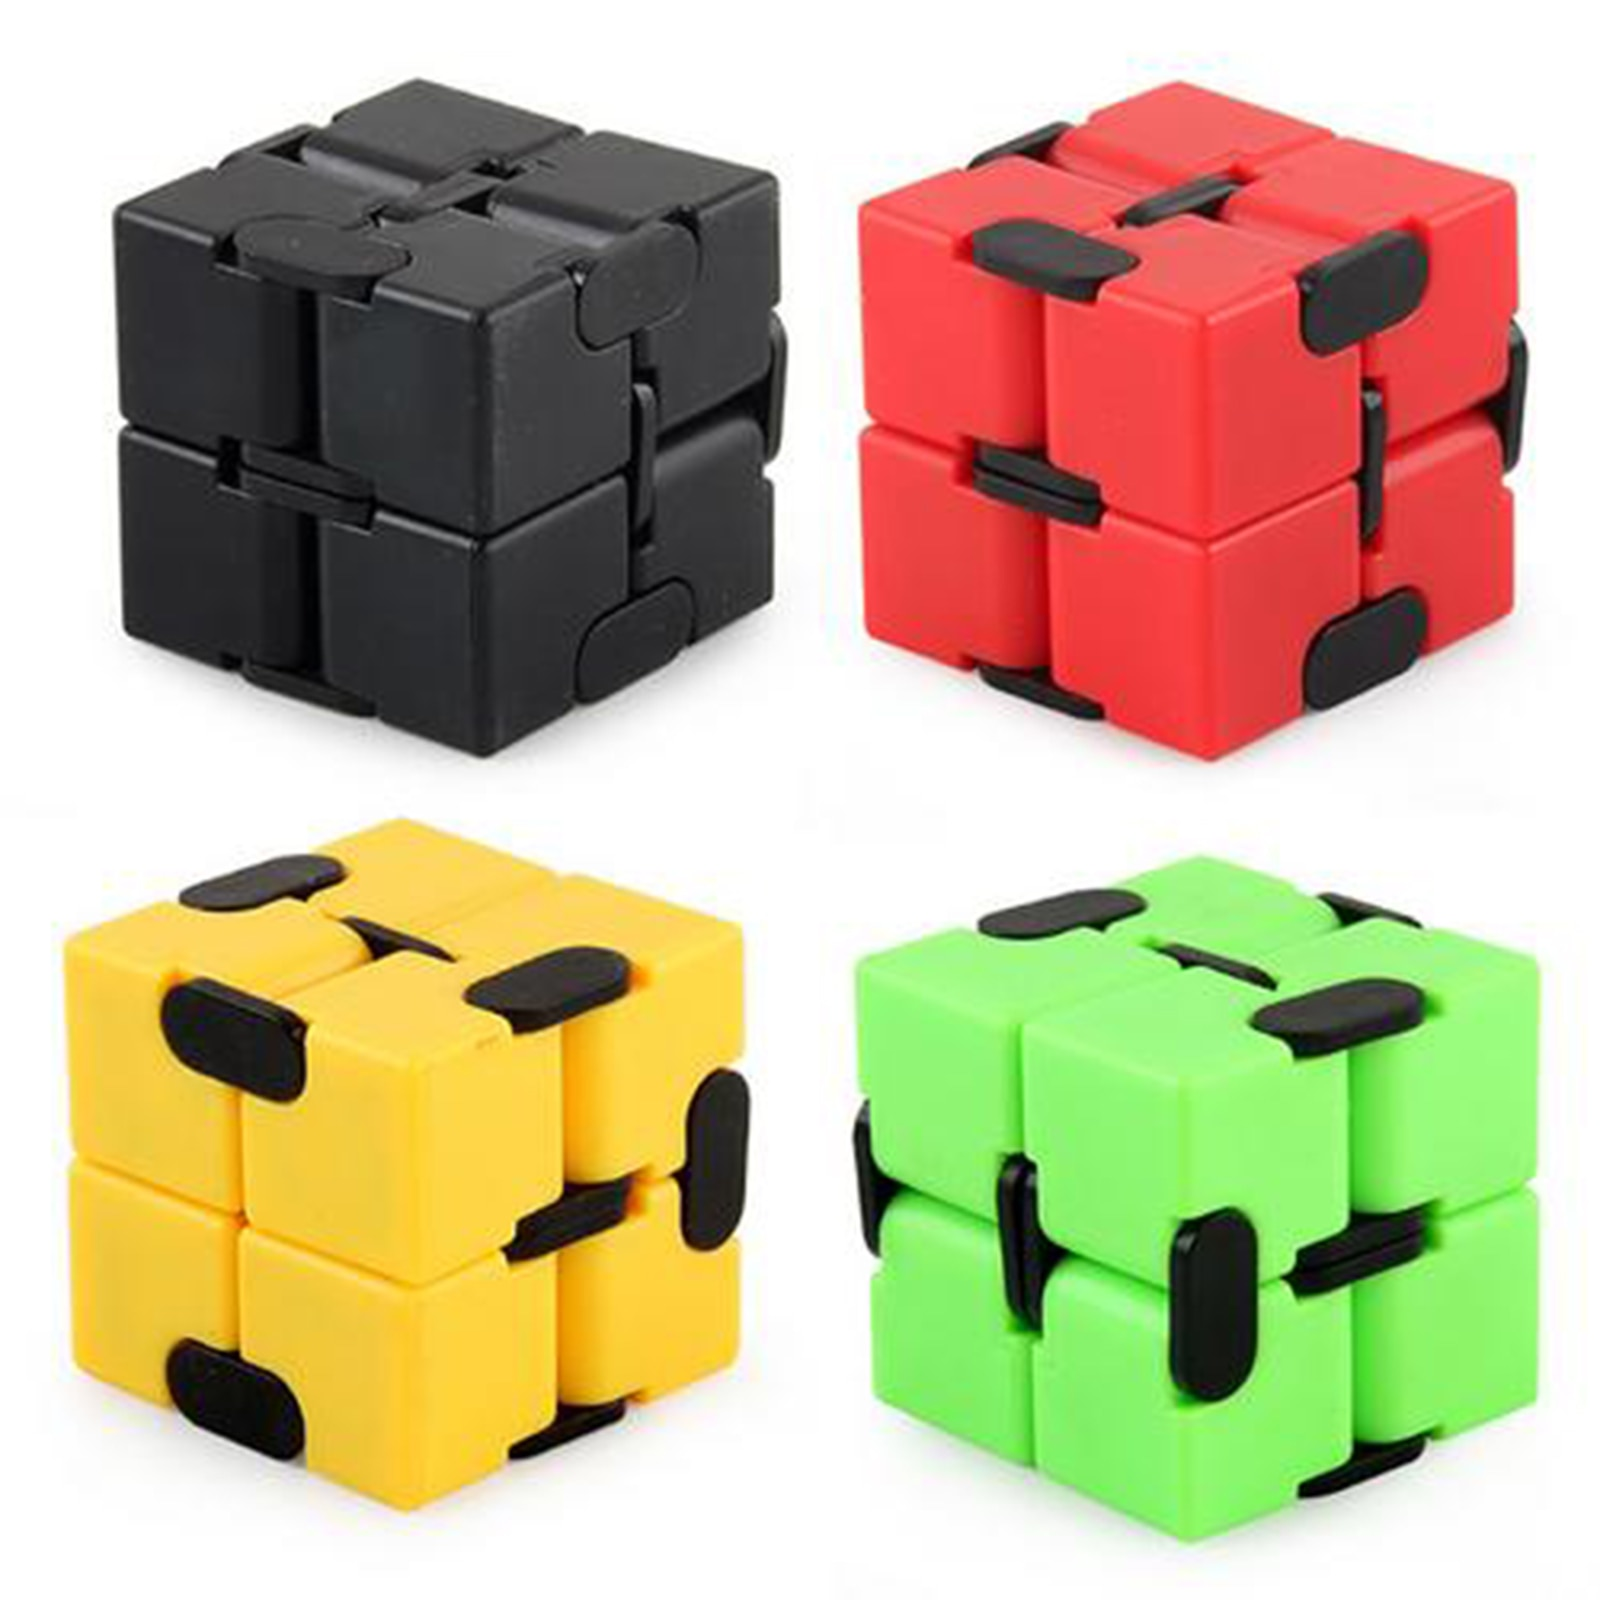 infinity cube magic square fidget toy 3408 - Wacky Track